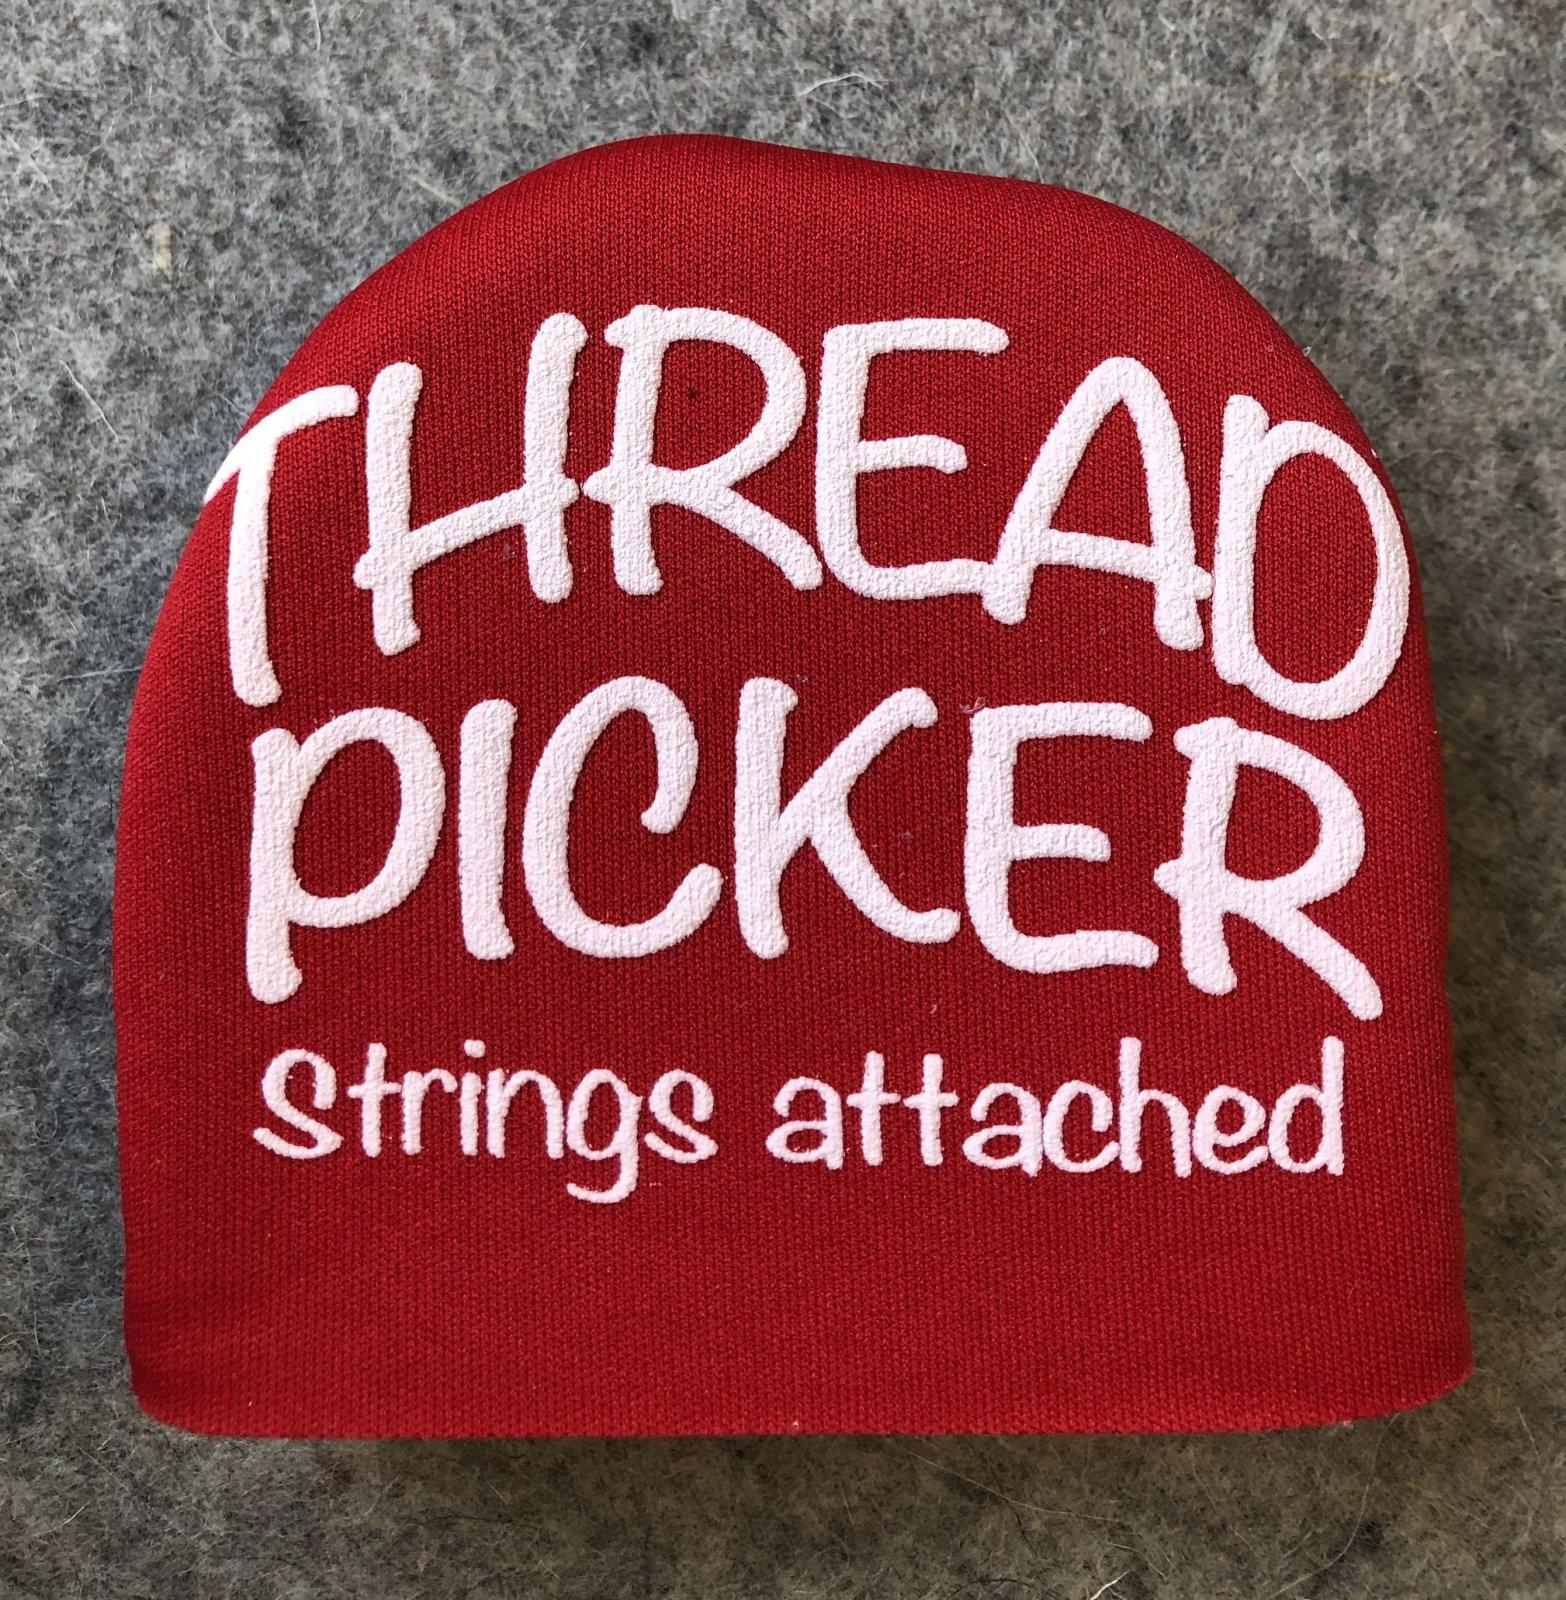 THREAD PICKER